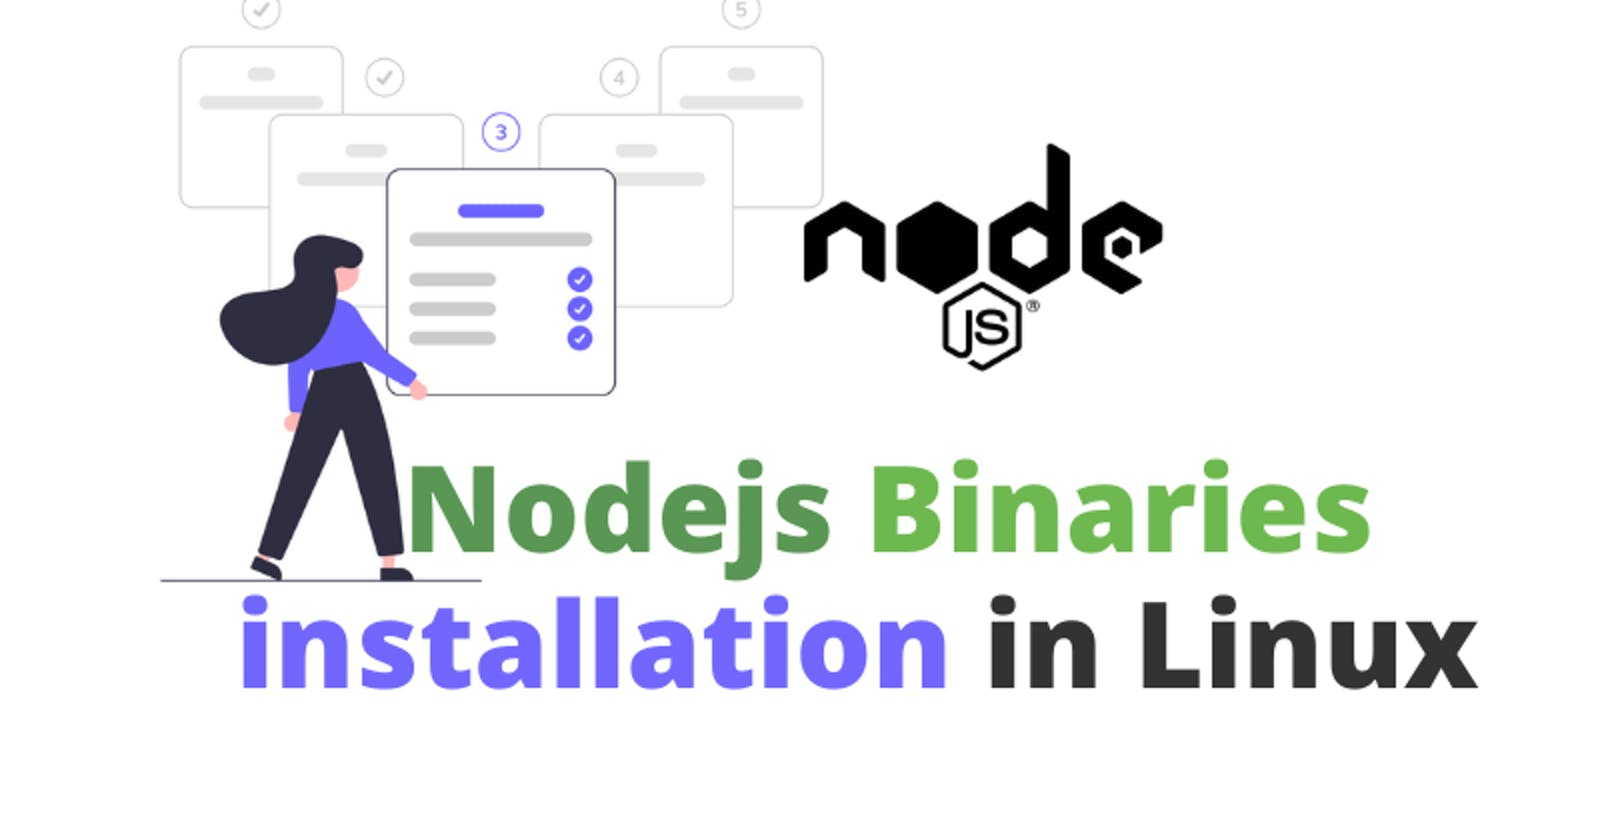 Install node and npm using Linux binaries